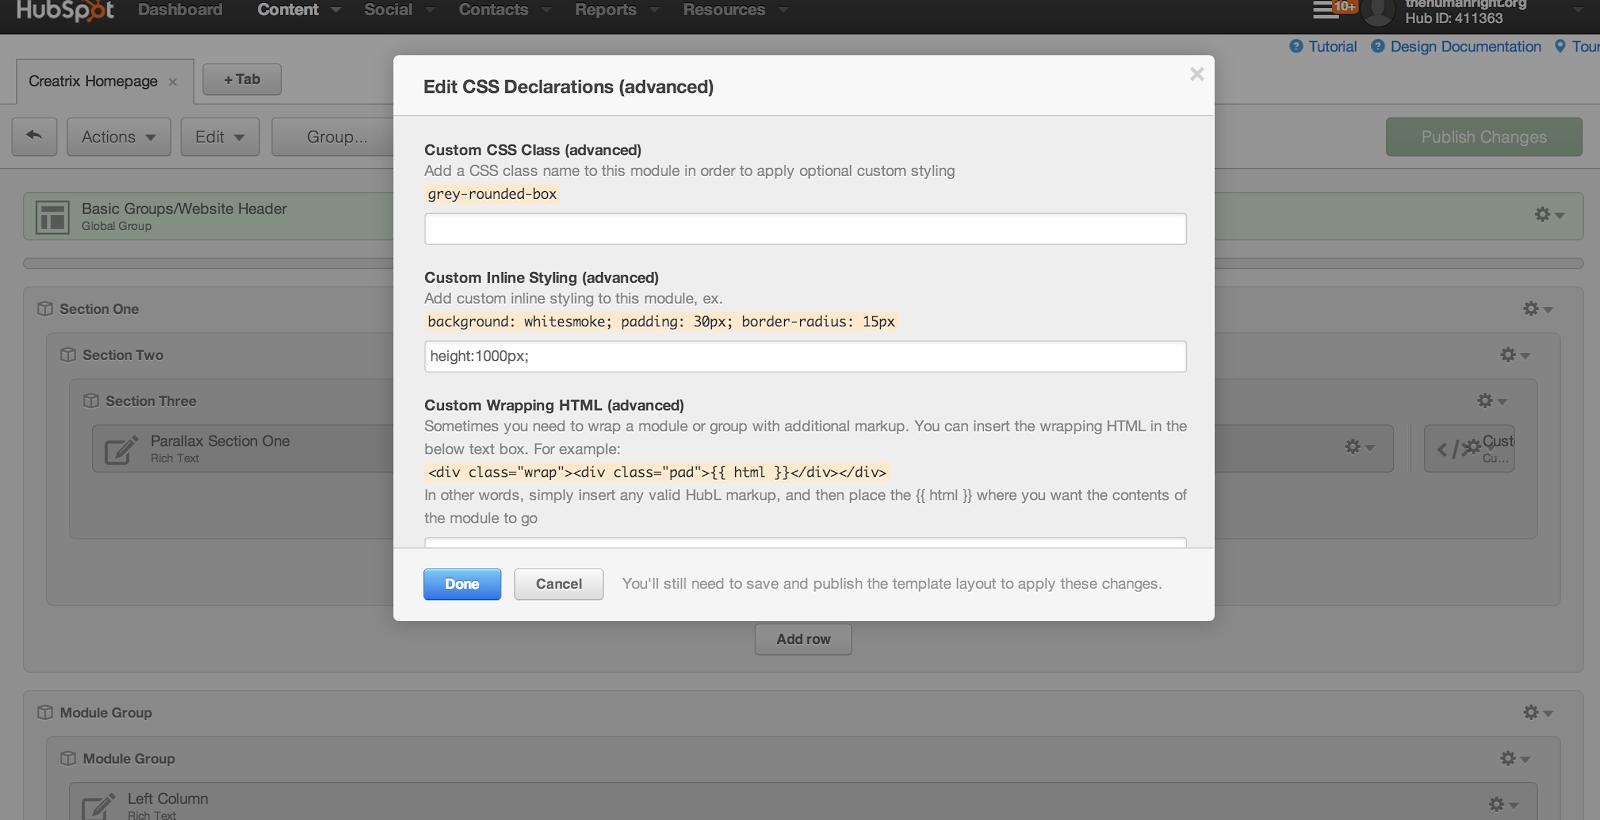 Edit CSS Declarations